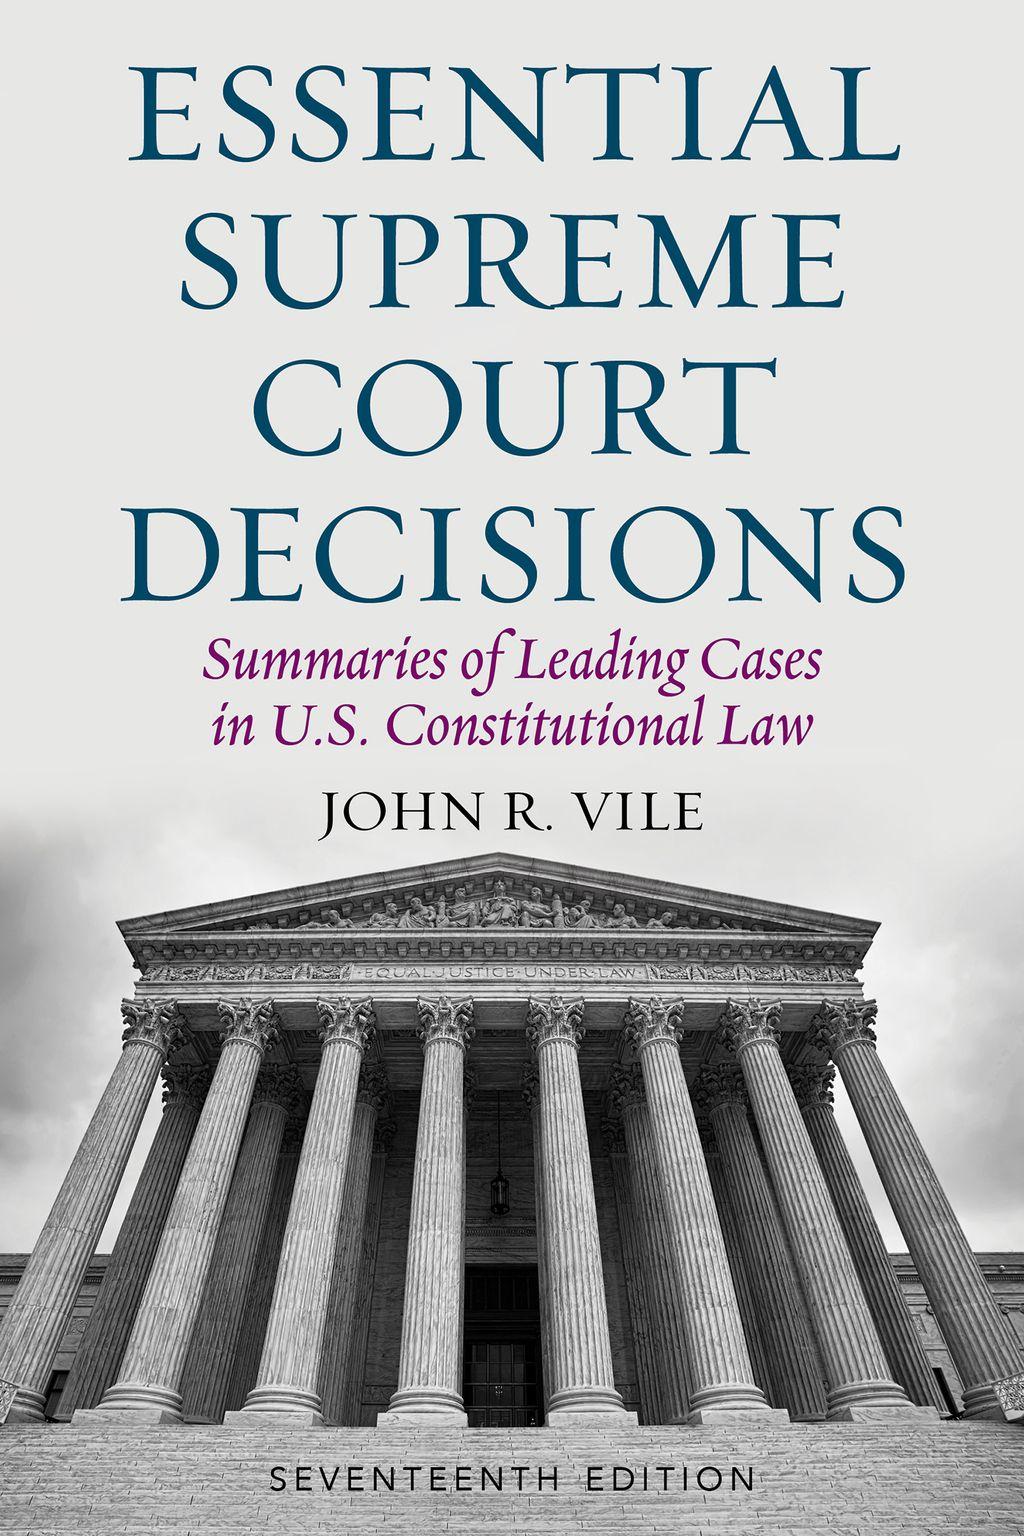 Essential Supreme Court Decisions Ebook